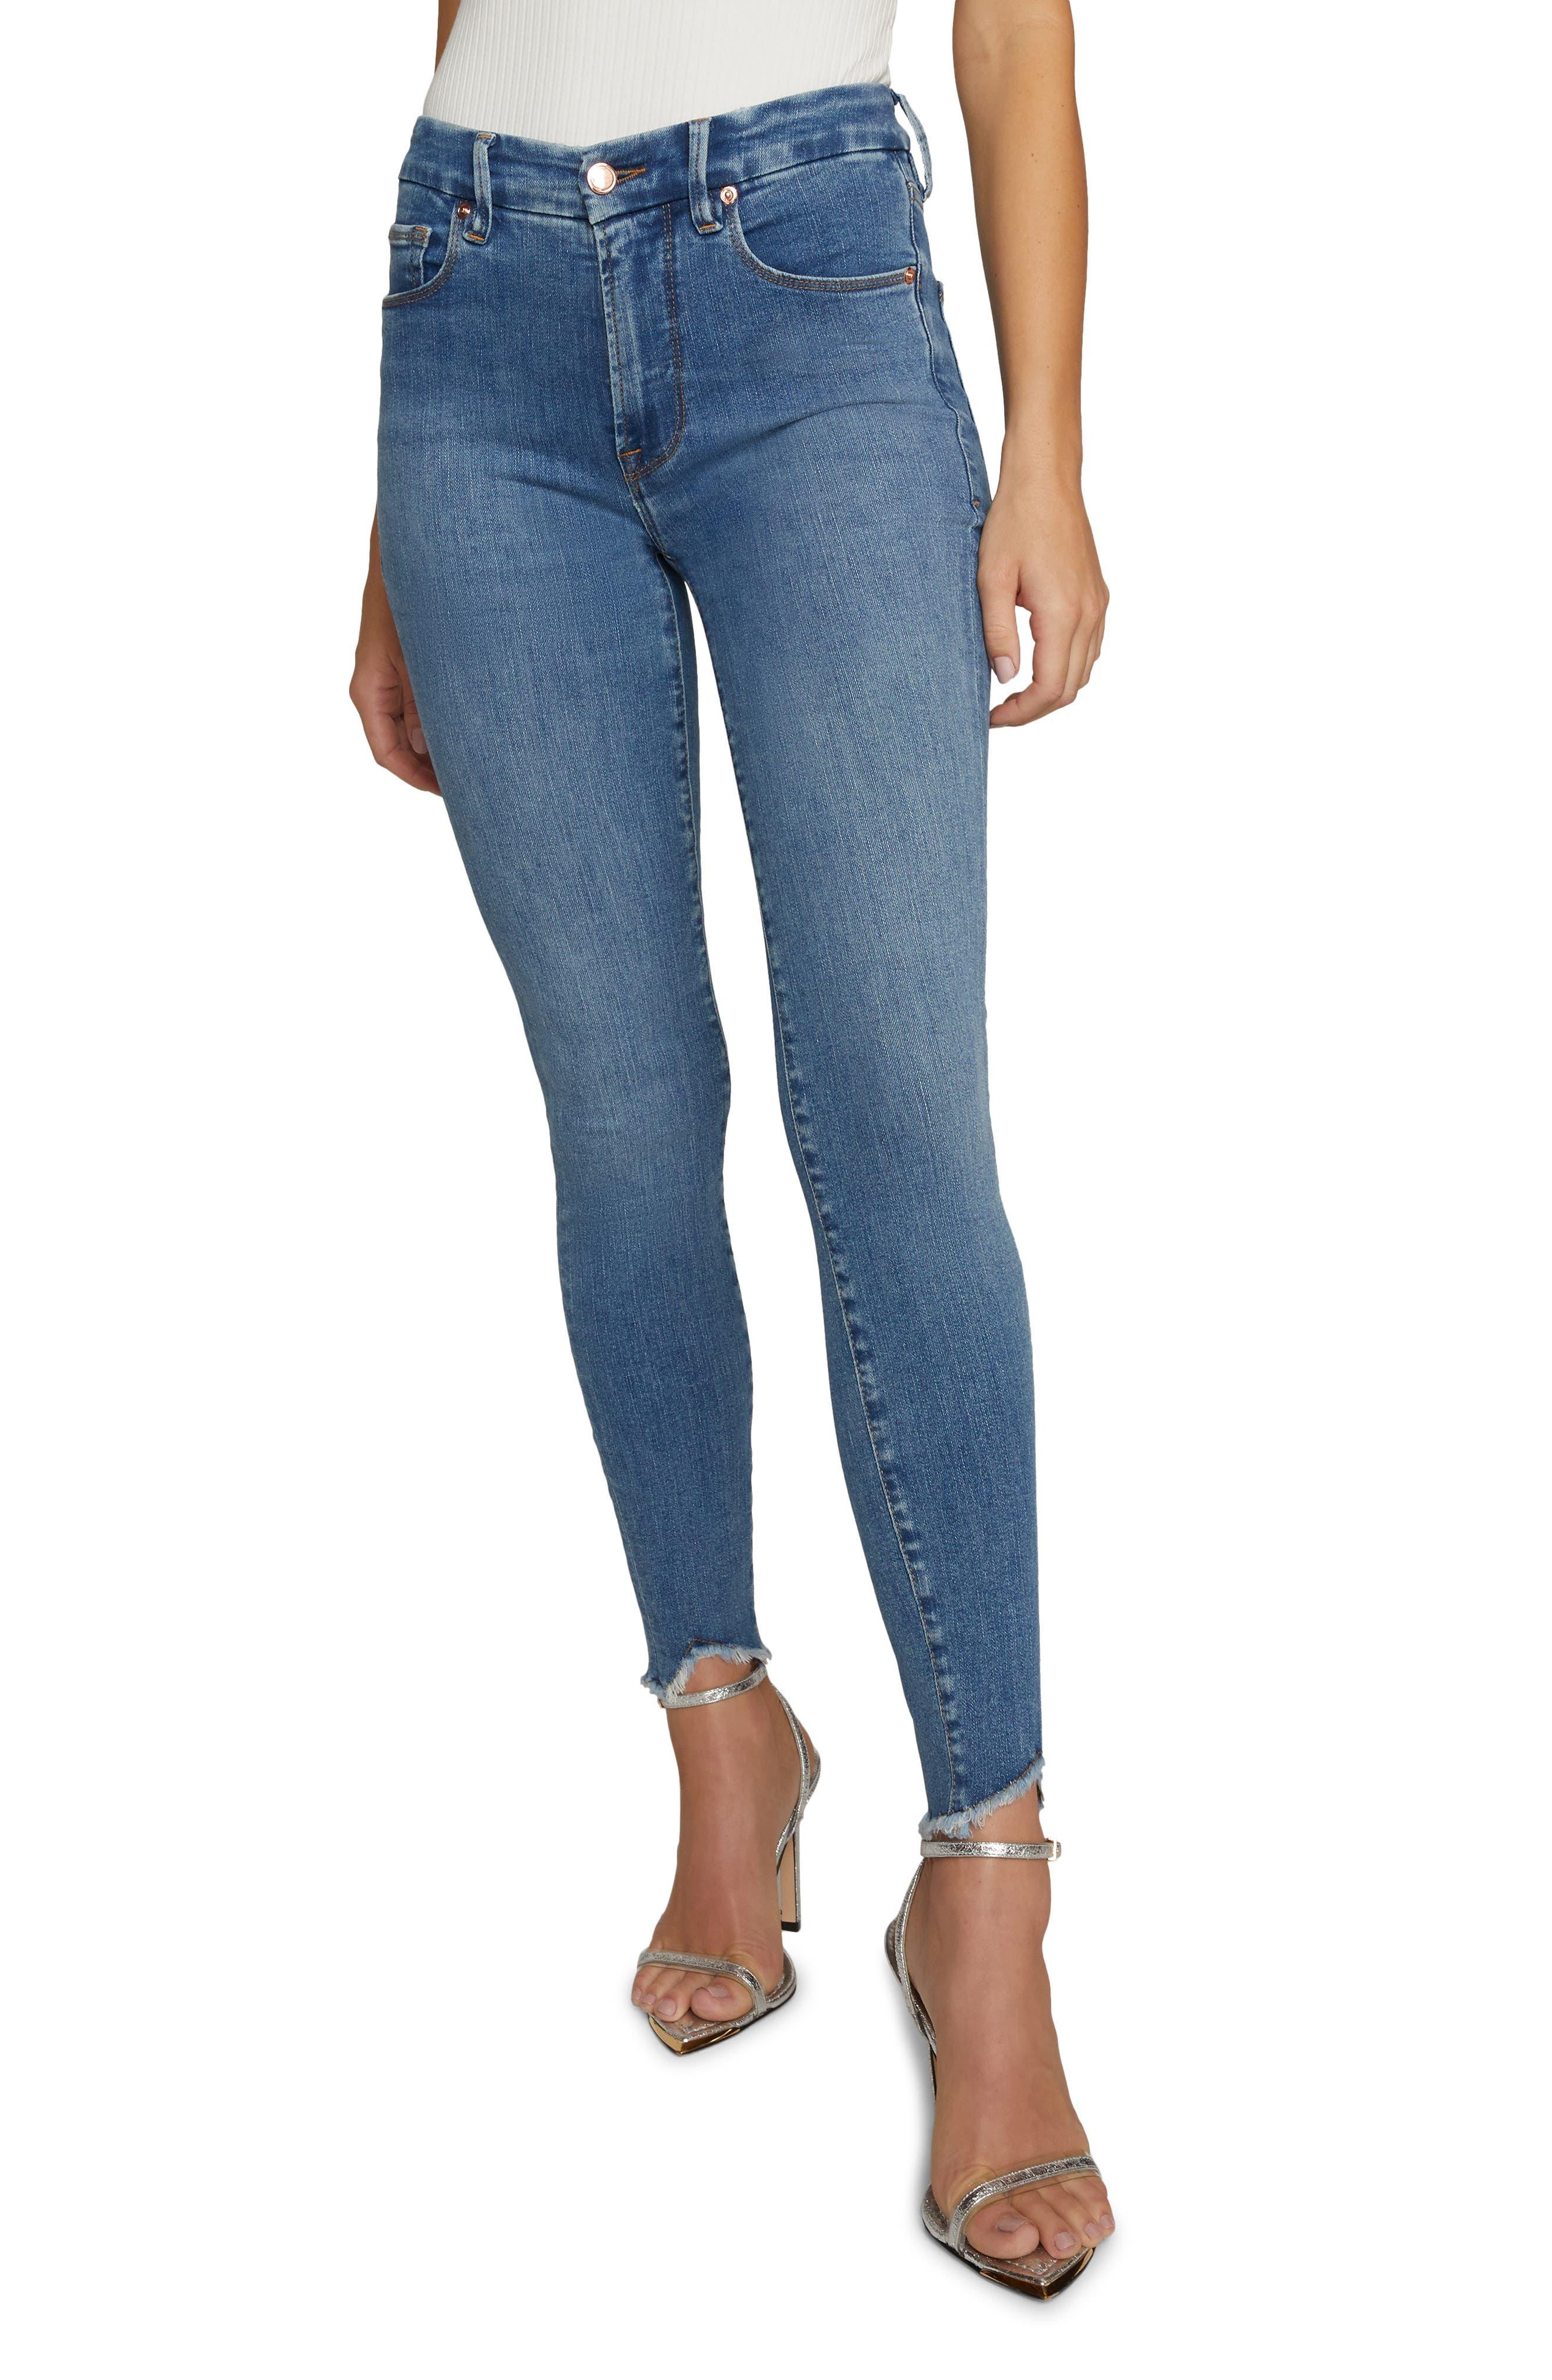 Women's Good American Good Legs High Waist Jagged Fray Hem Skinny Jeans